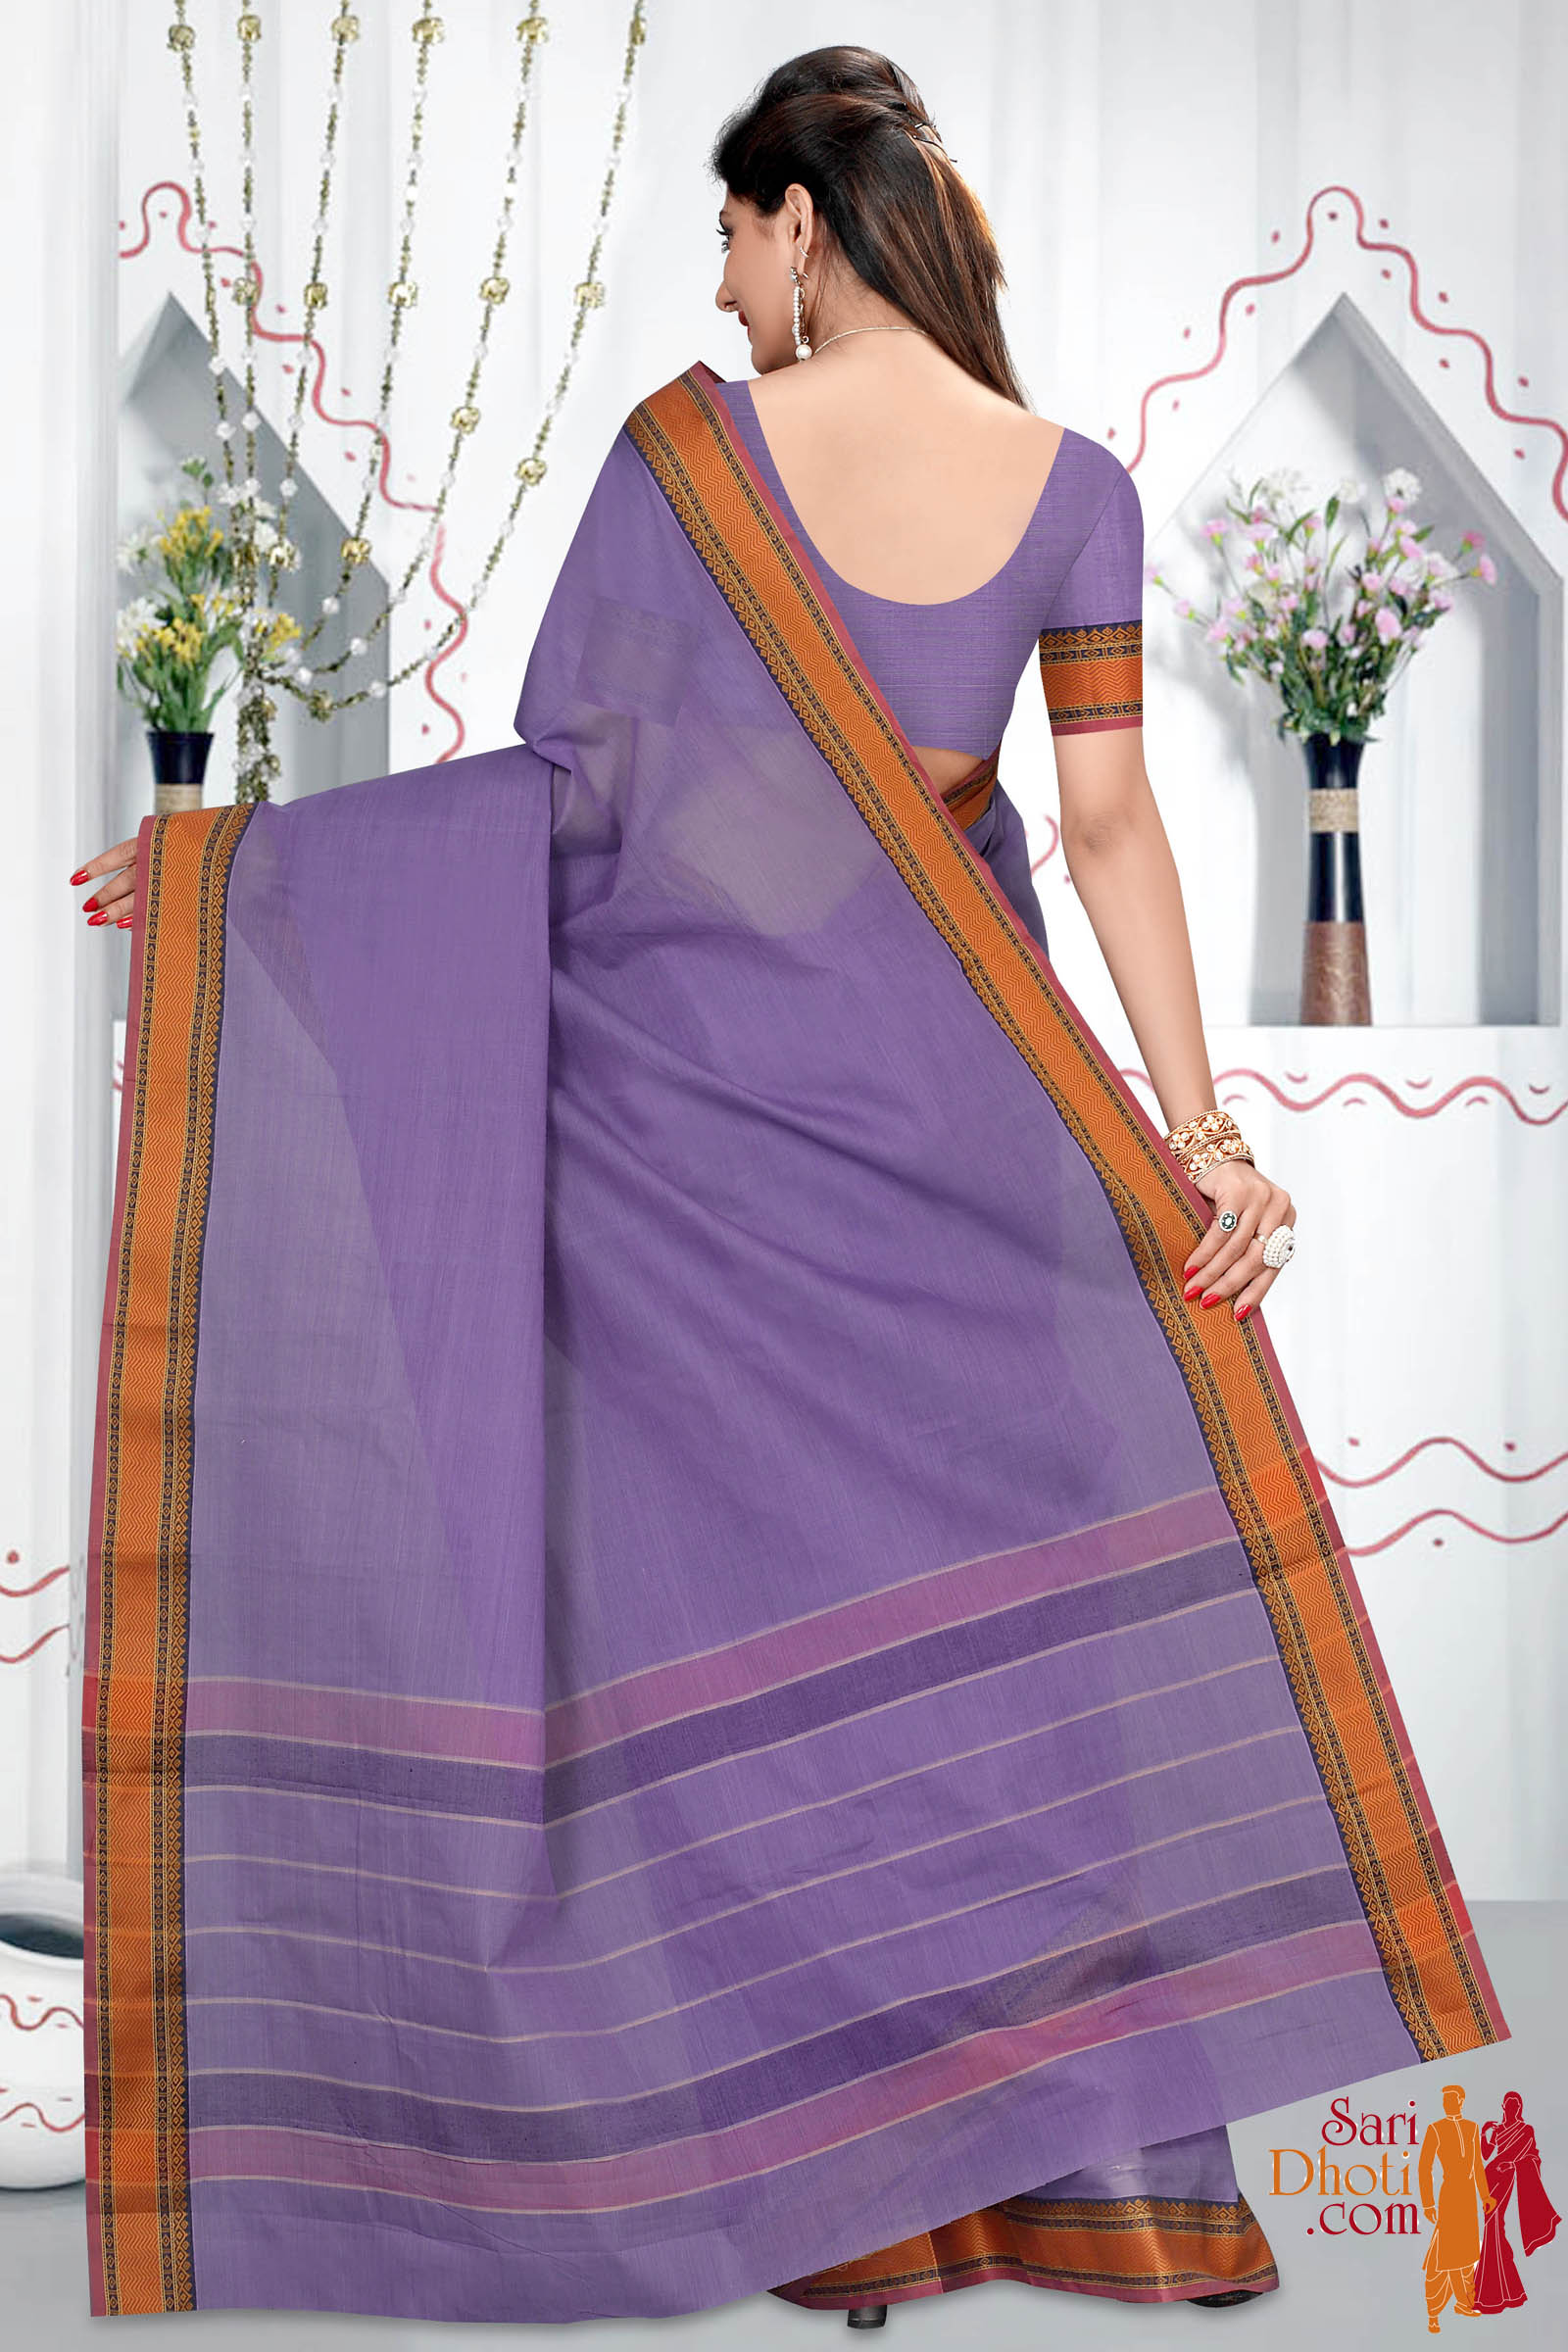 Kanchi Cotton 3747